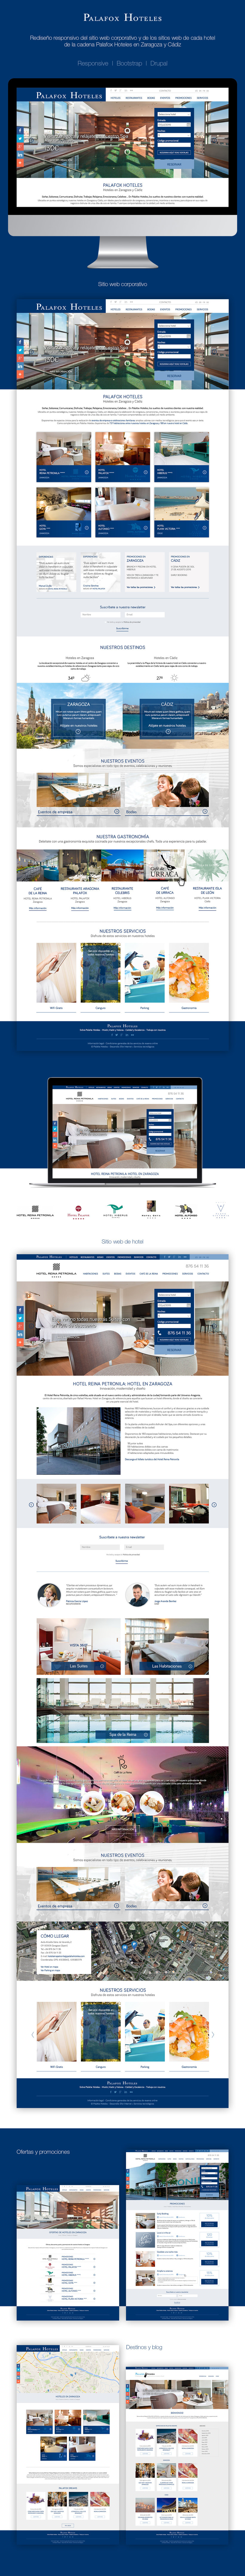 Palafox Hoteles | Websites -1